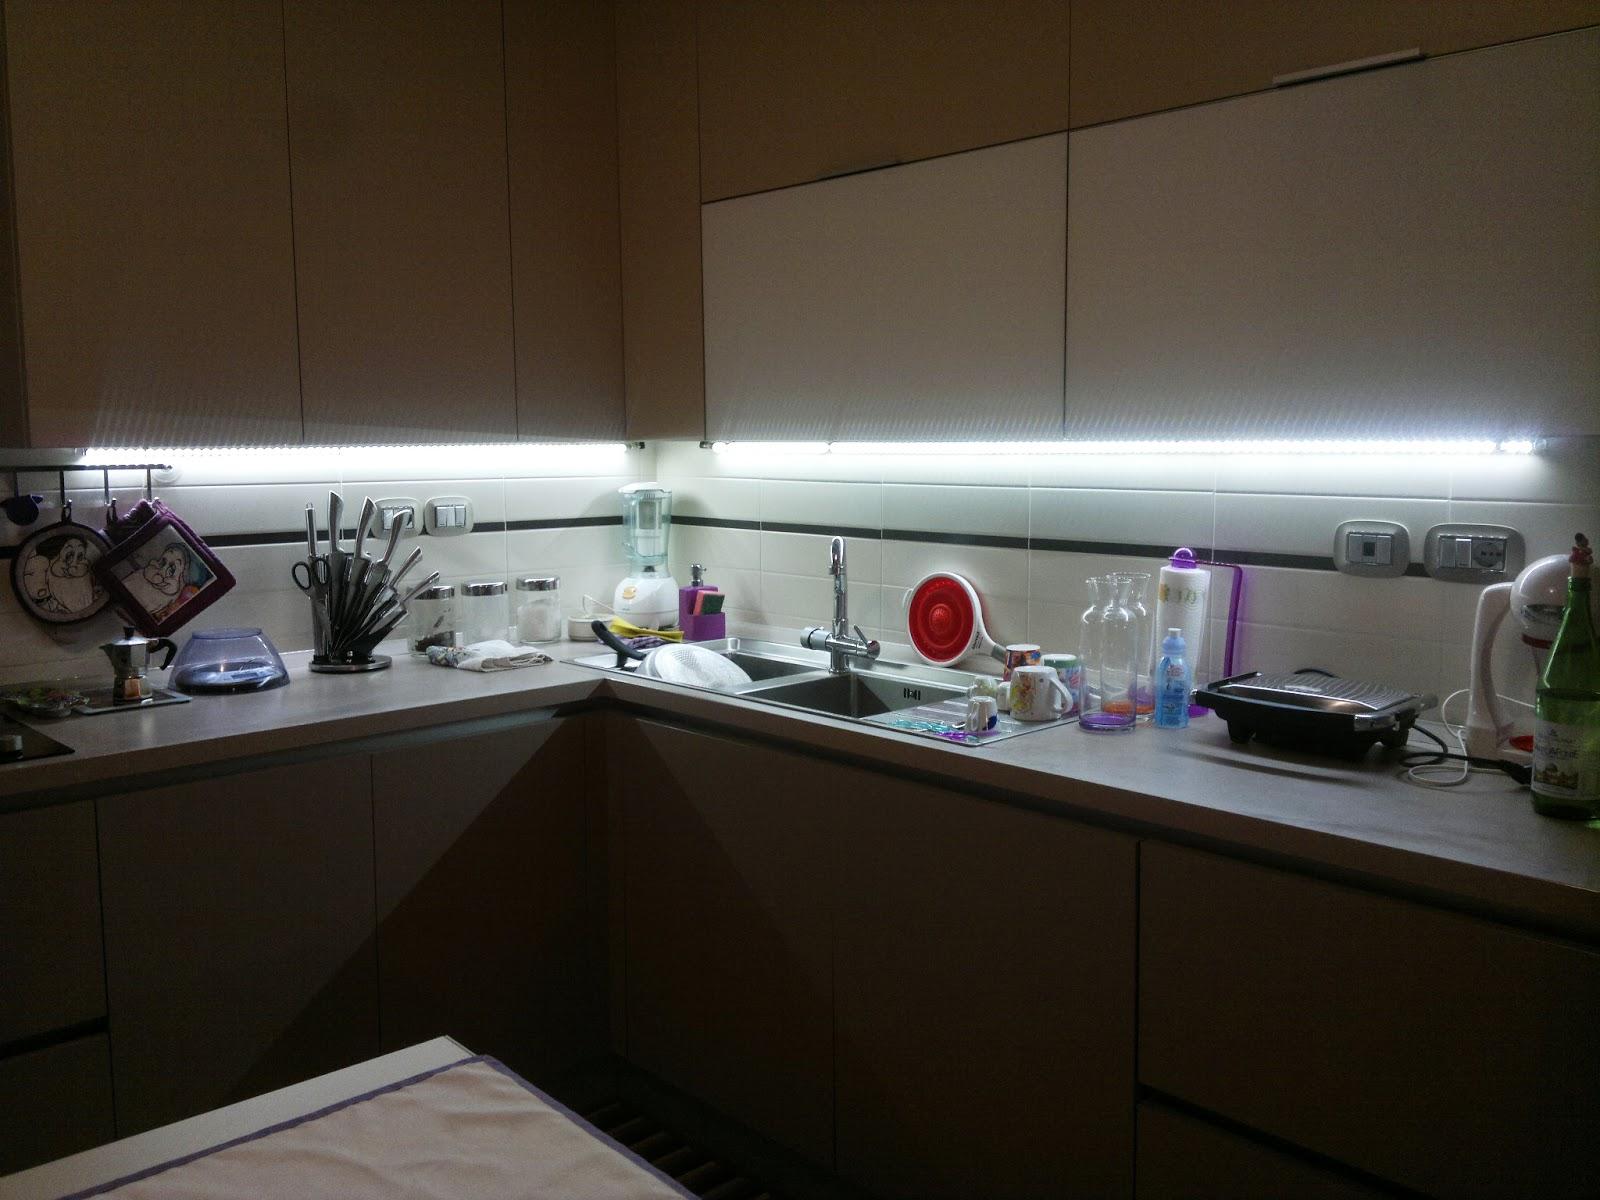 Luci Sottopensili Cucina | Illuminazione Artificiale Cucina ...